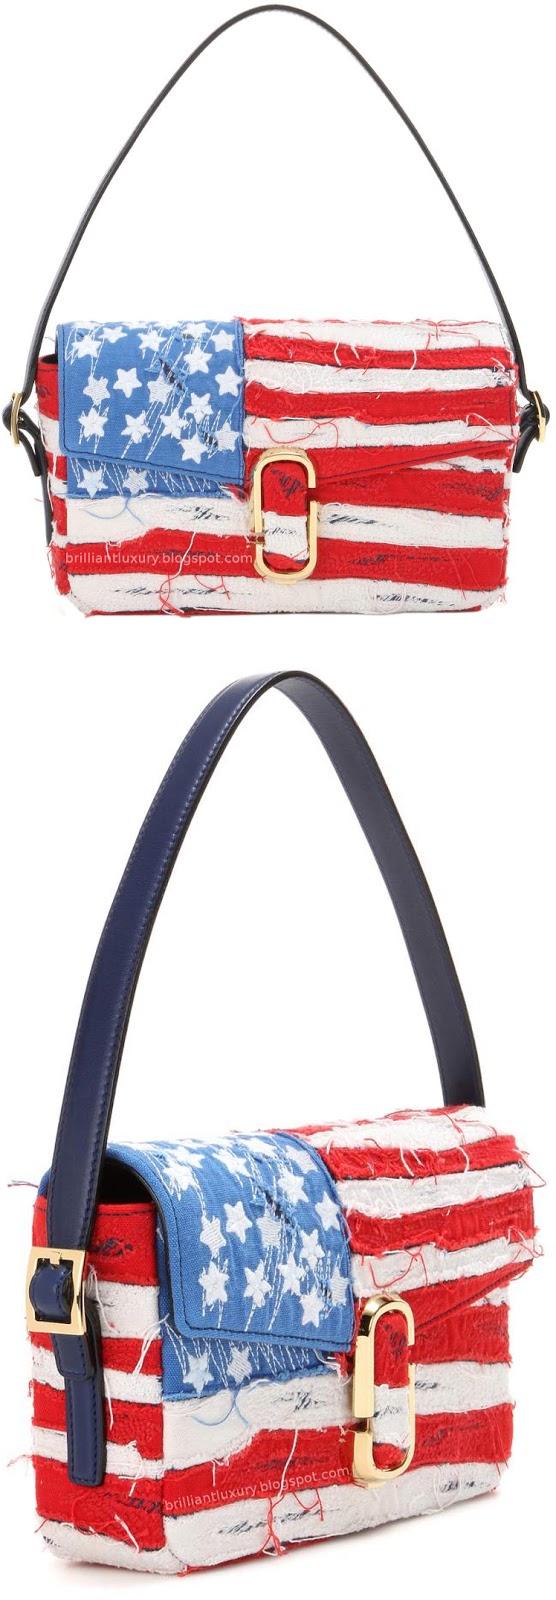 Brilliant Luxury ♦ Marc Jacobs american flag shoulder bag